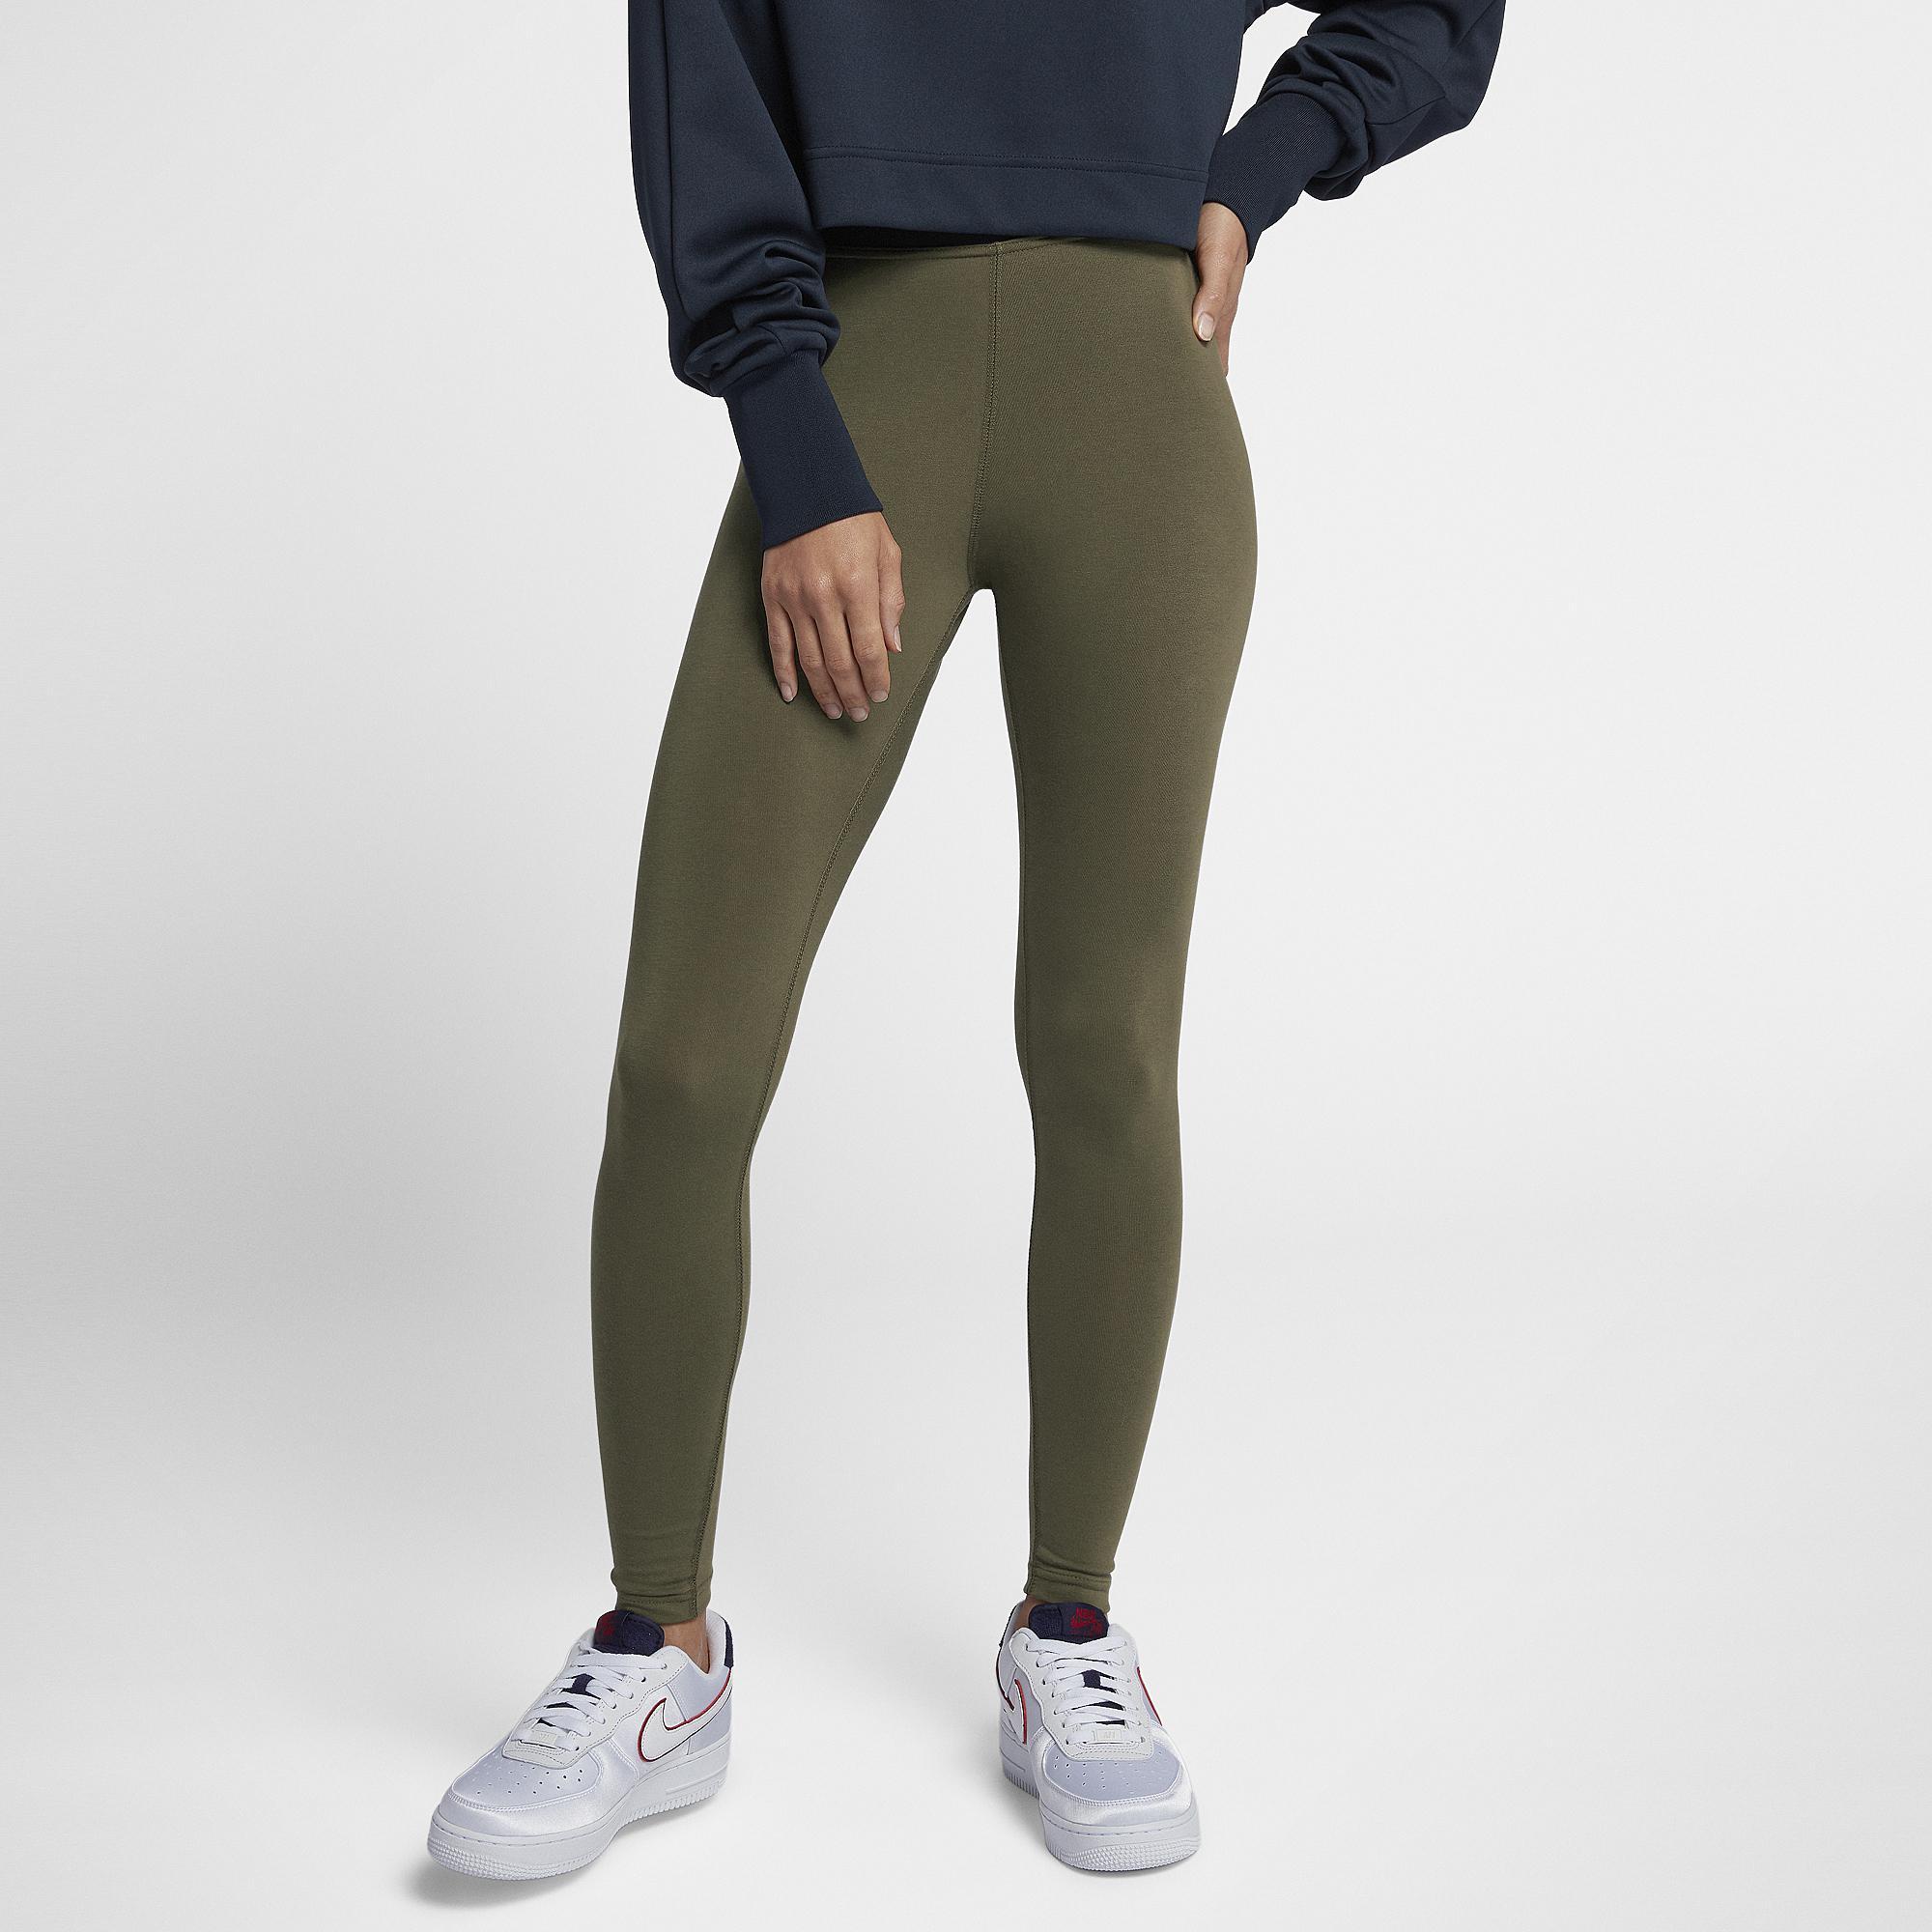 08b183d92ee53 Nike. Women's Green High-waisted Futura Logo Leggings